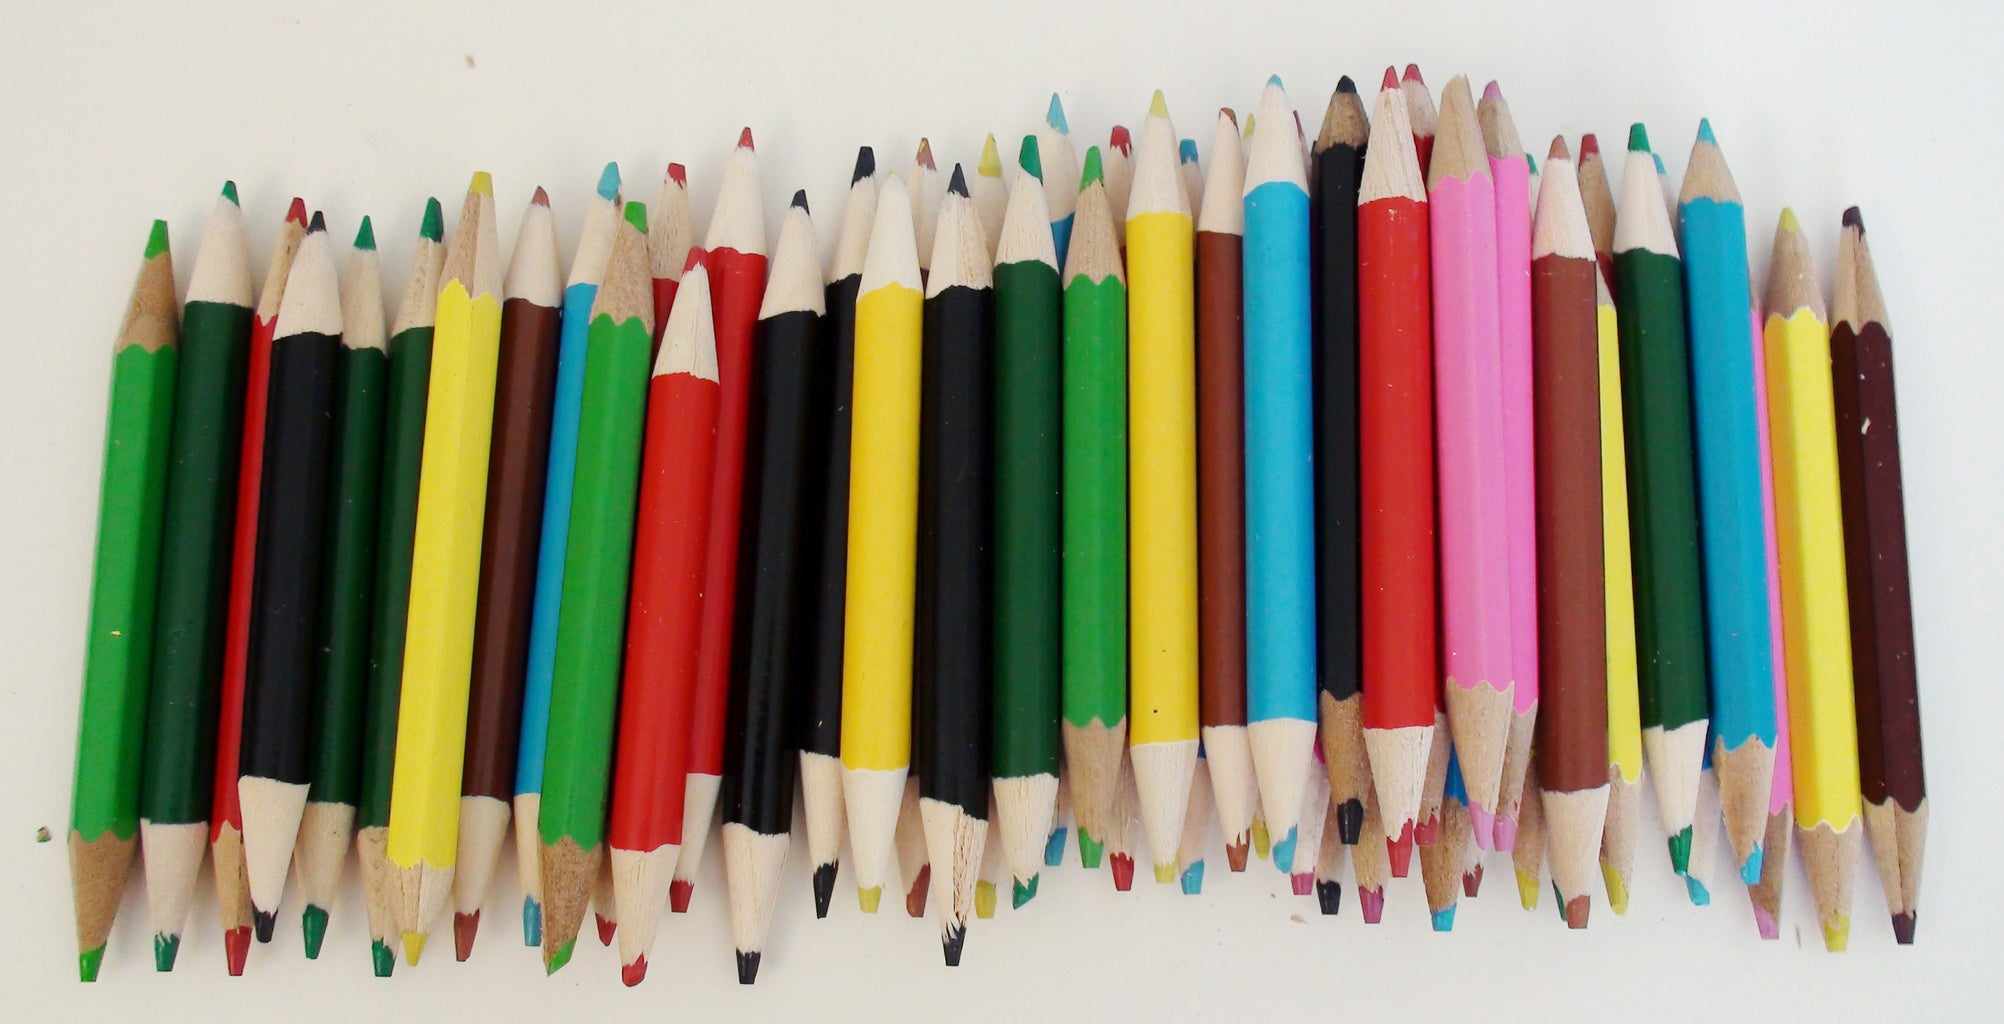 Ready, Set, Sharpen Your Pencils!